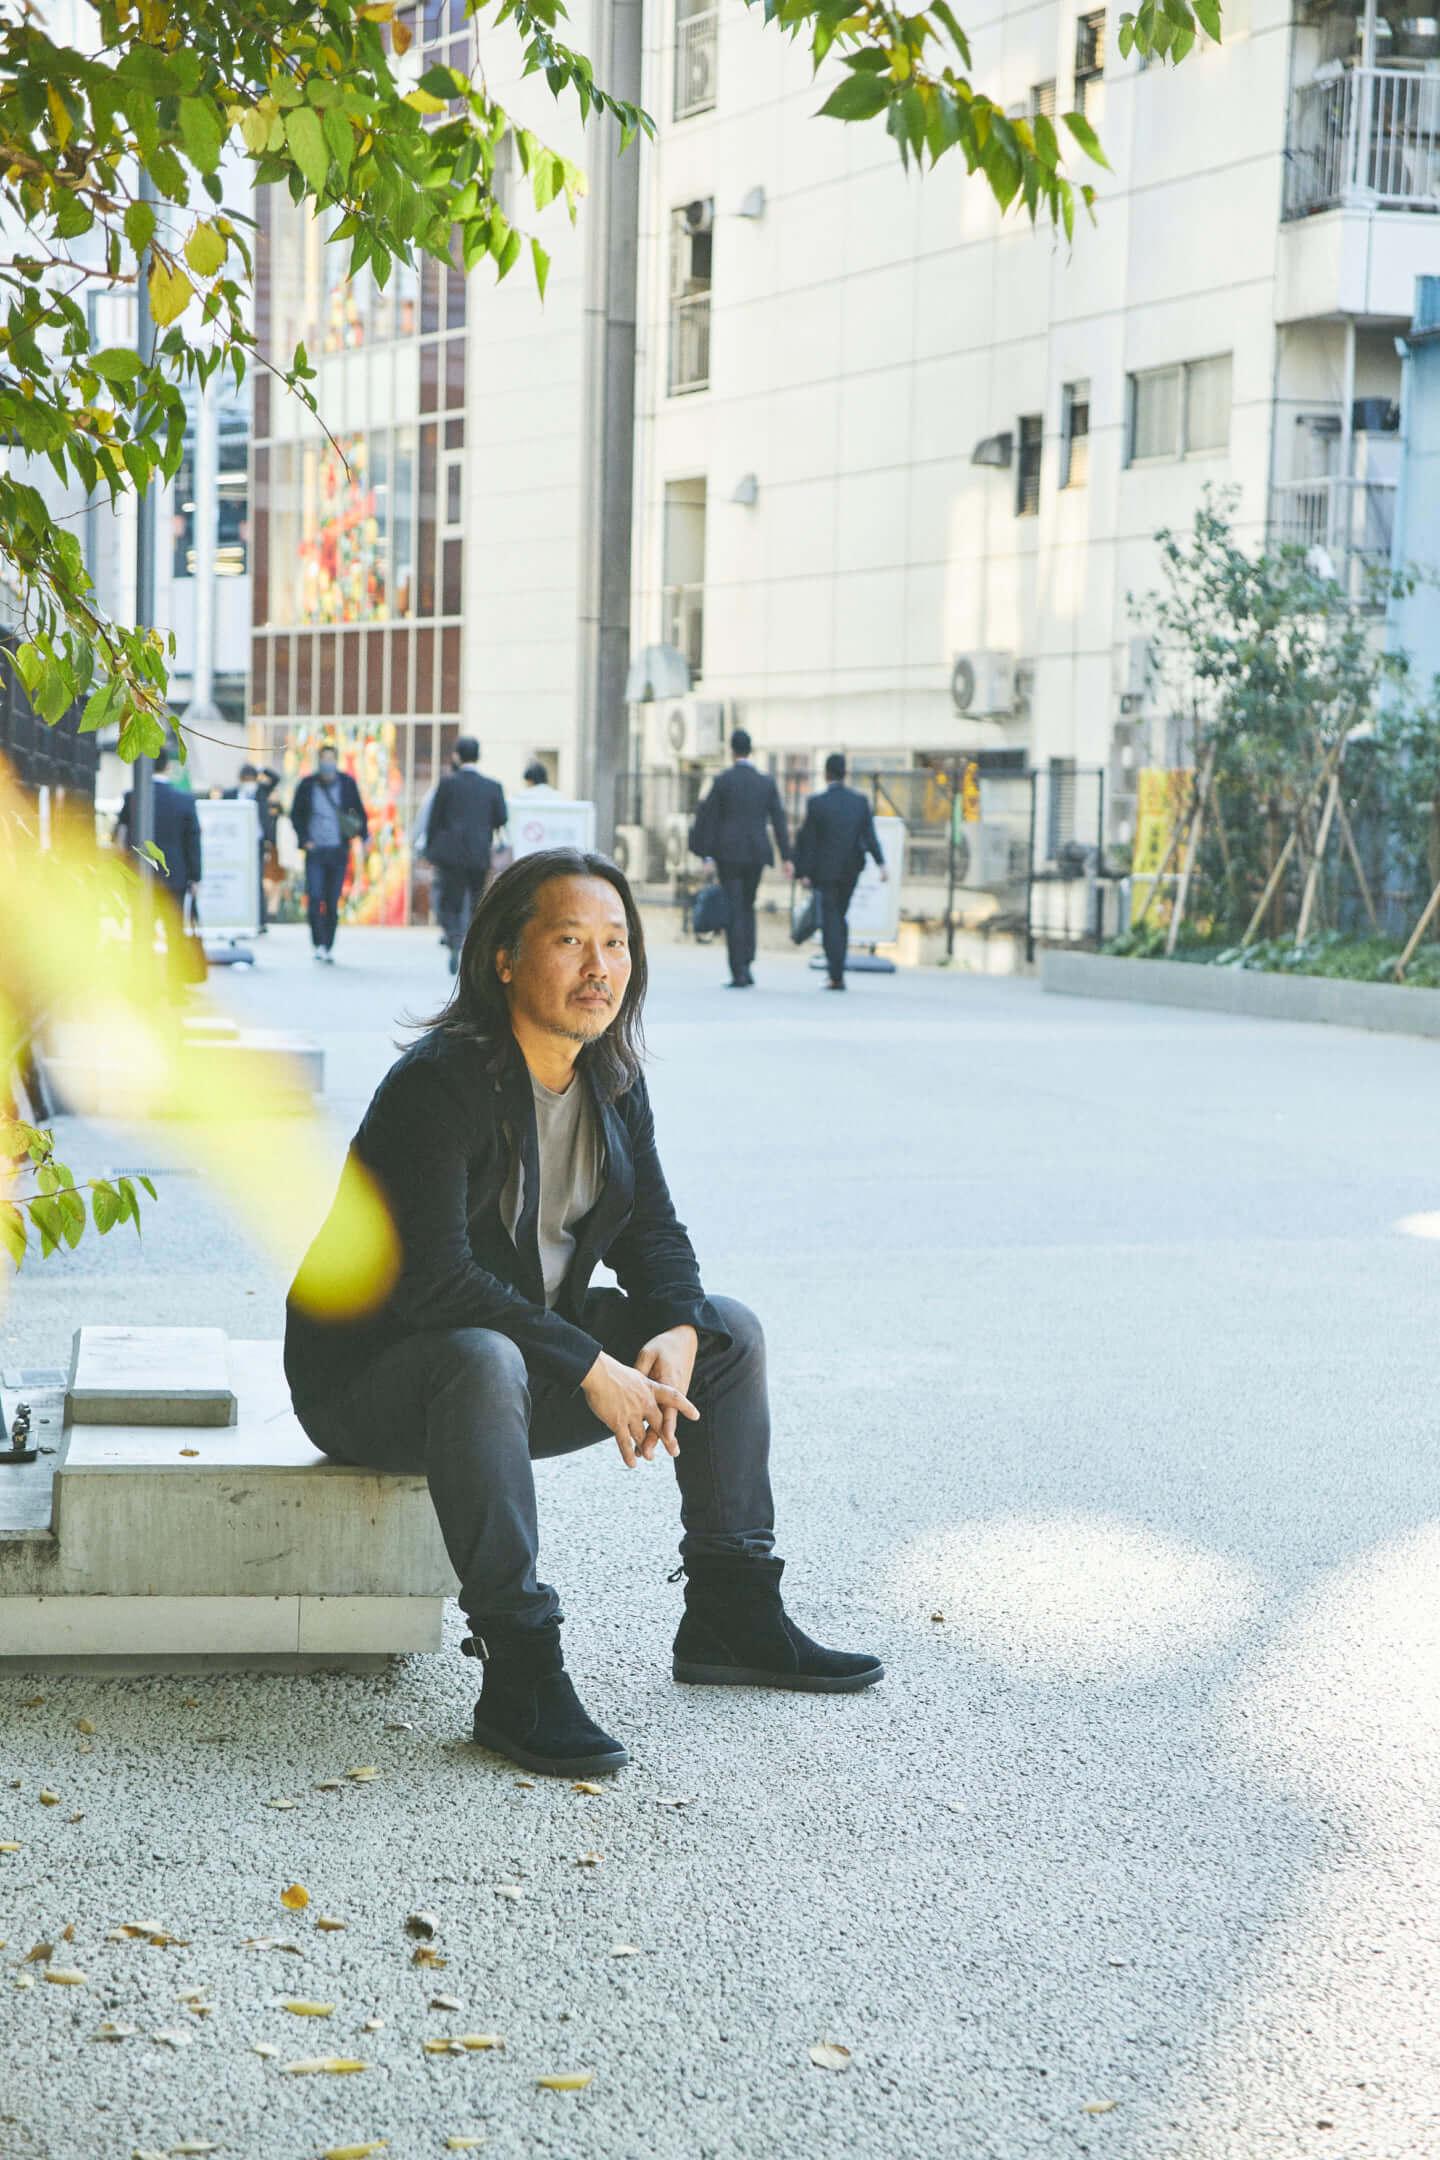 <DIESEL XXX>、<バーチャル渋谷 au 5G ハロウィーンフェス>の仕掛け人KDDI三浦伊知郎が 5G時代に描く未来とは interview201210_miura-01-1440x2160